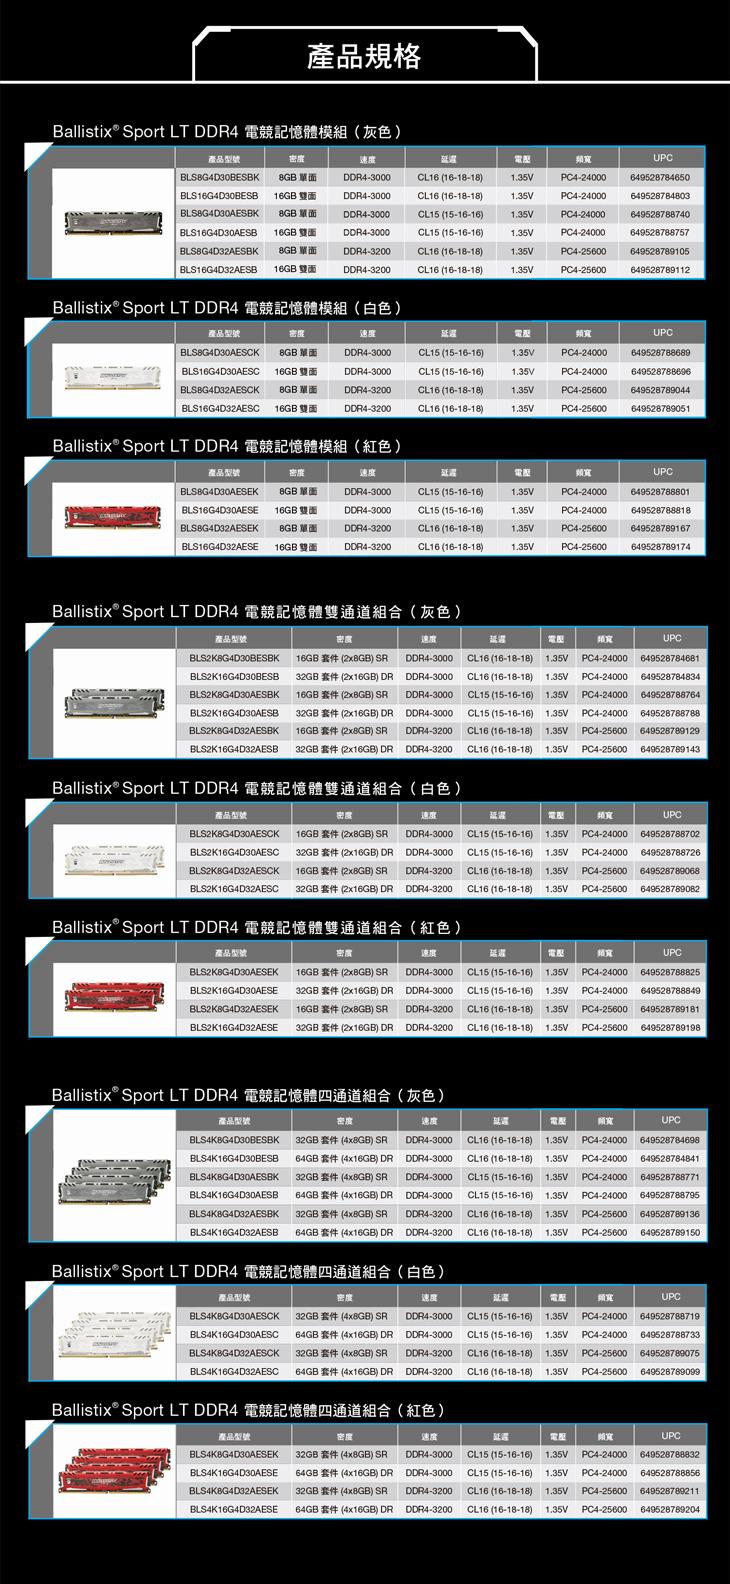 eca1951f-2f7d-41e5-b5e4-5d22042b87d327e18c21-39a6-4d64-a9c5-77dd599a0034.jpg